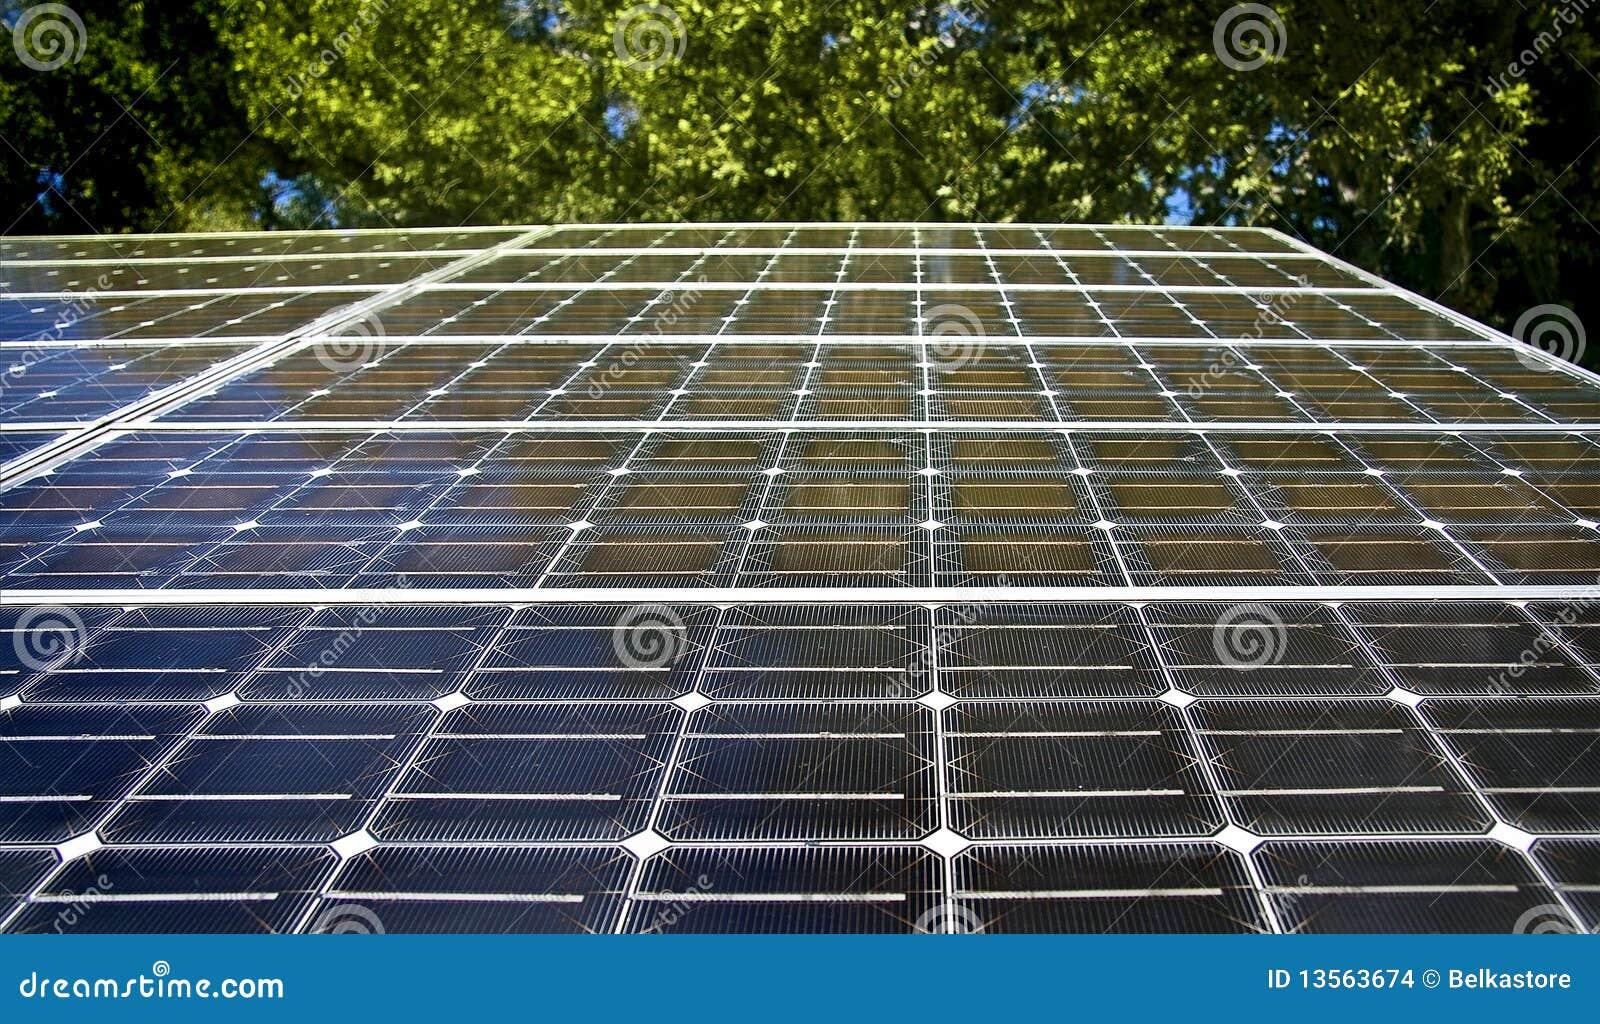 solar panel background - photo #40